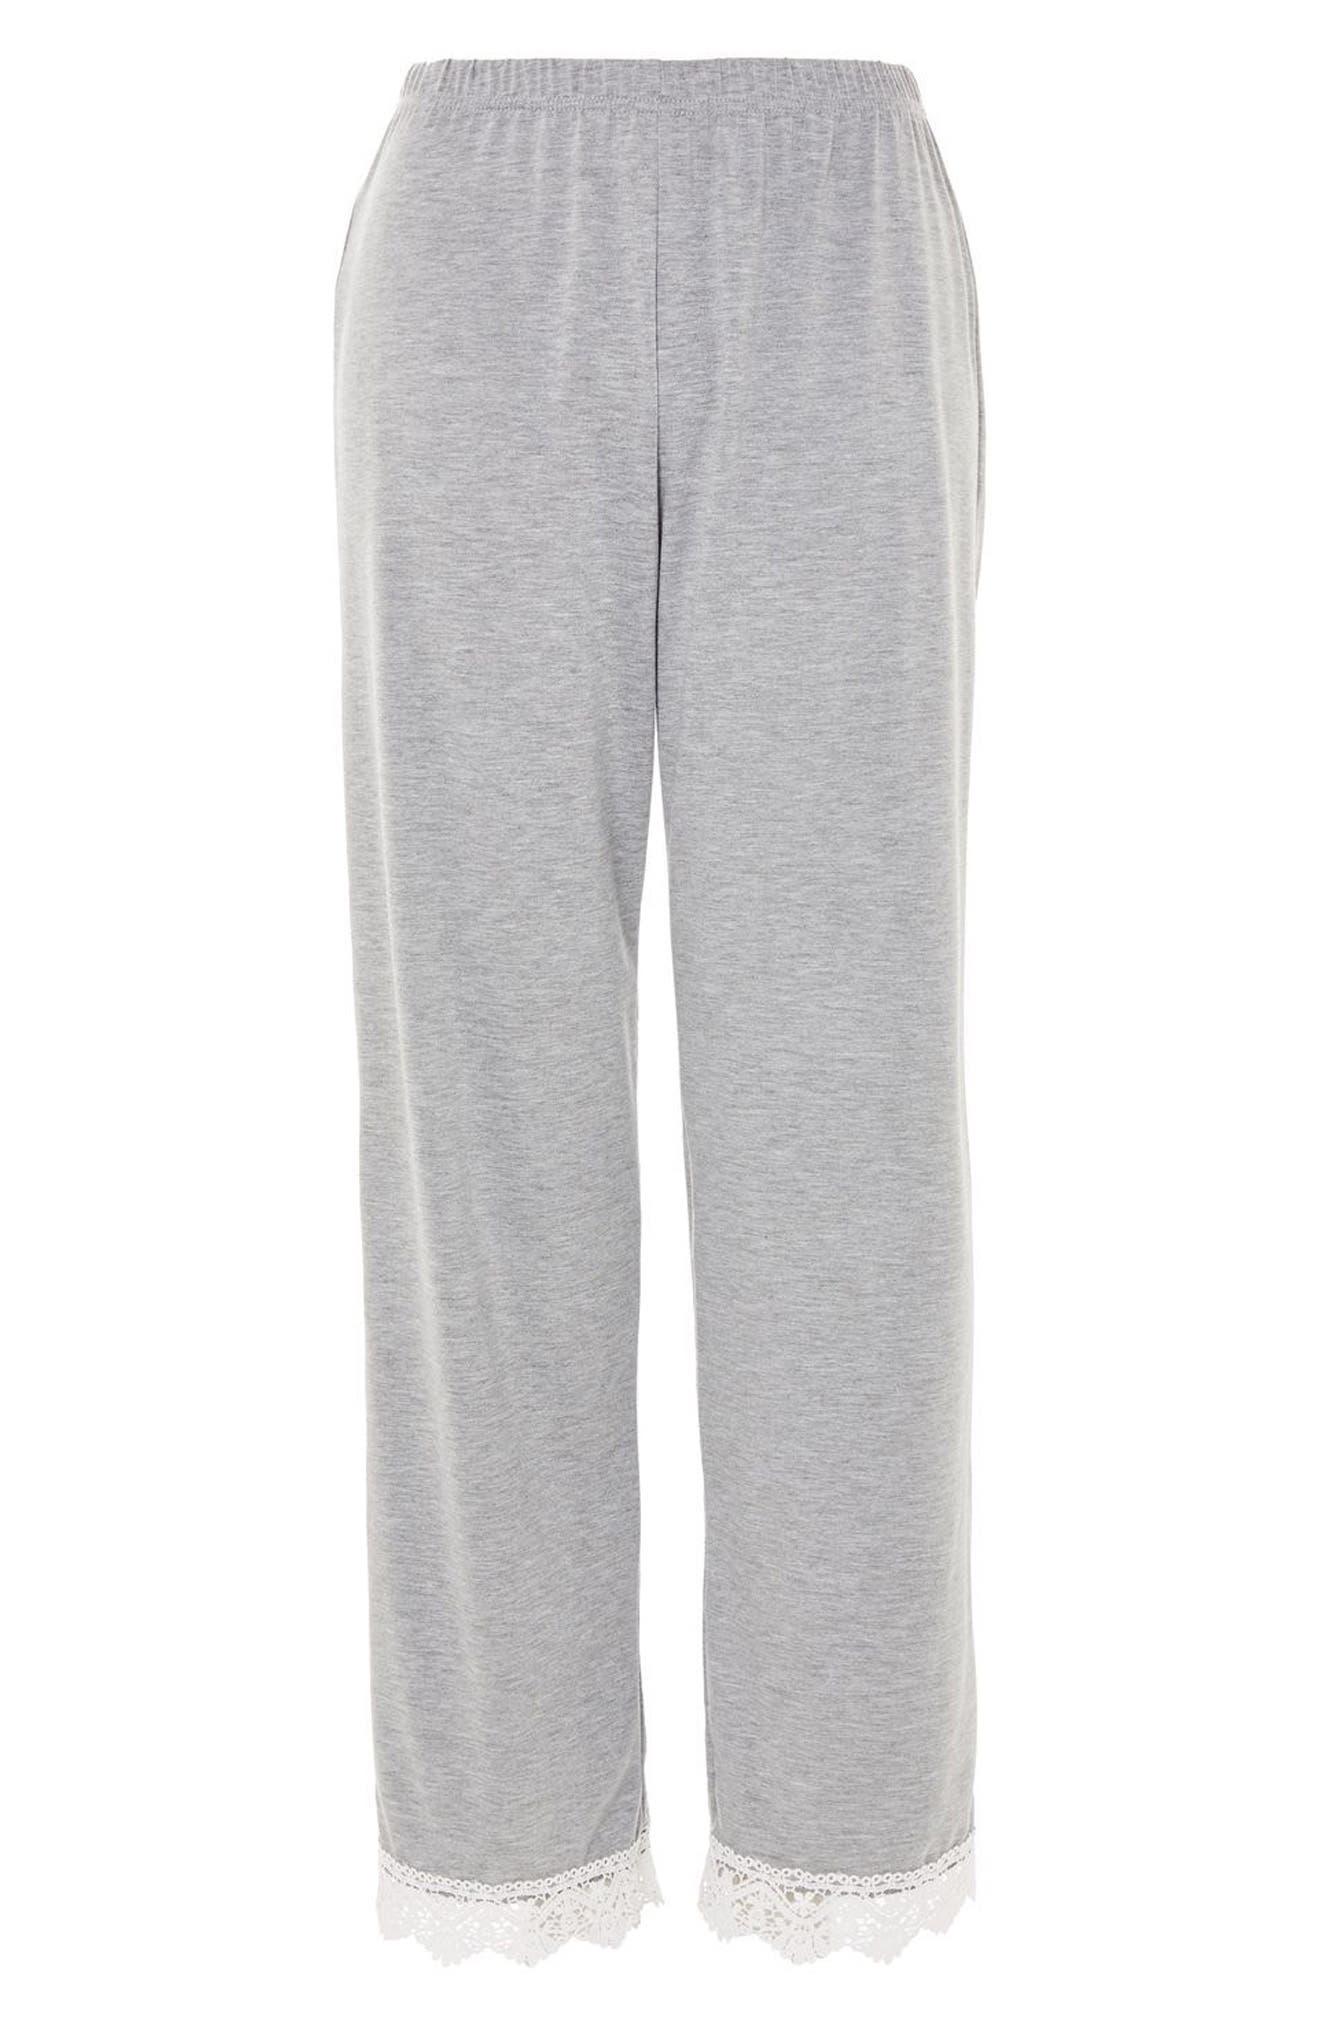 Crochet Trim Pajama Pants,                             Main thumbnail 1, color,                             Grey Multi